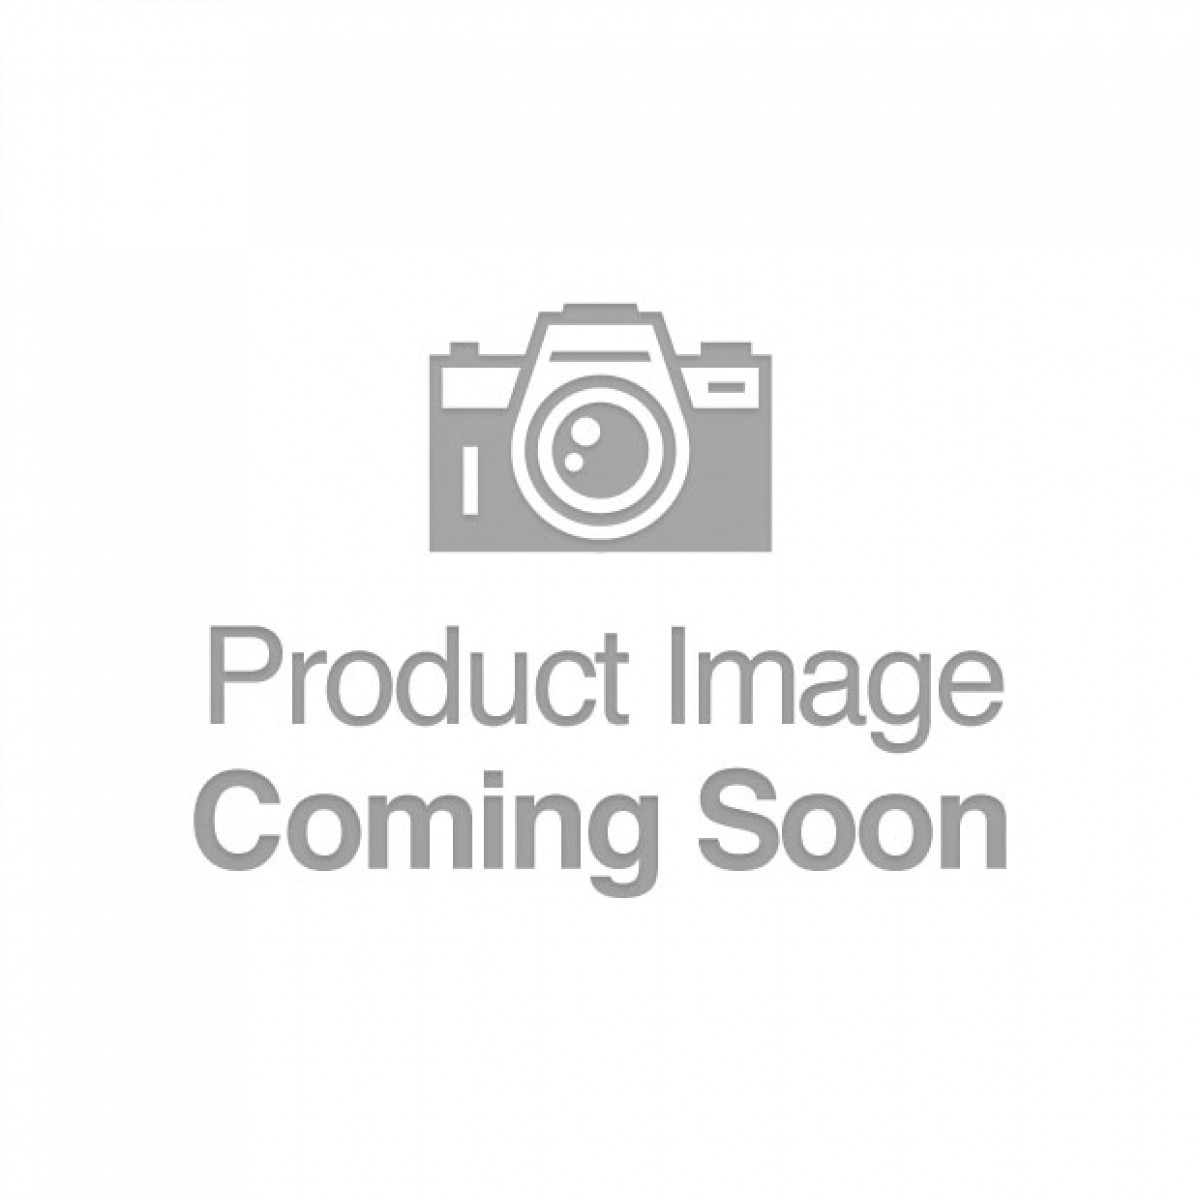 PDX Plus Pick Your Pleasure Stroker - Brown